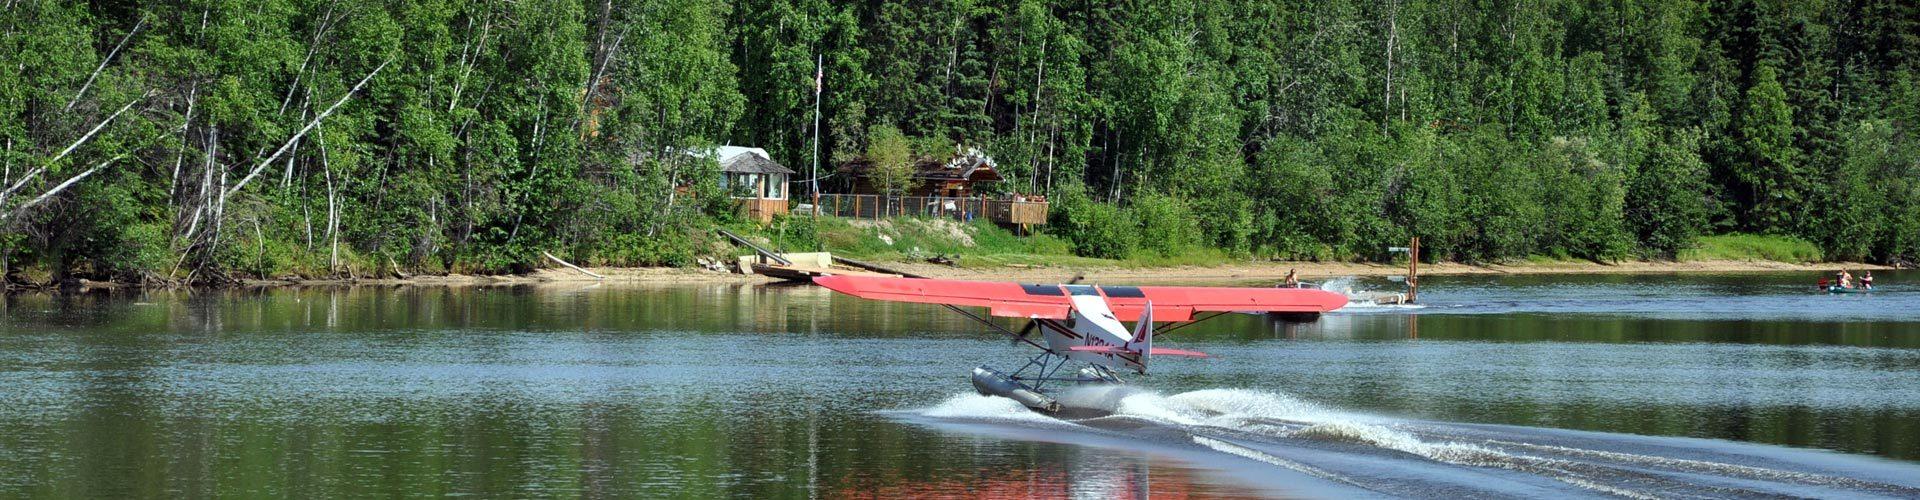 Wasserflugzeug am Chena River, Fairbanks